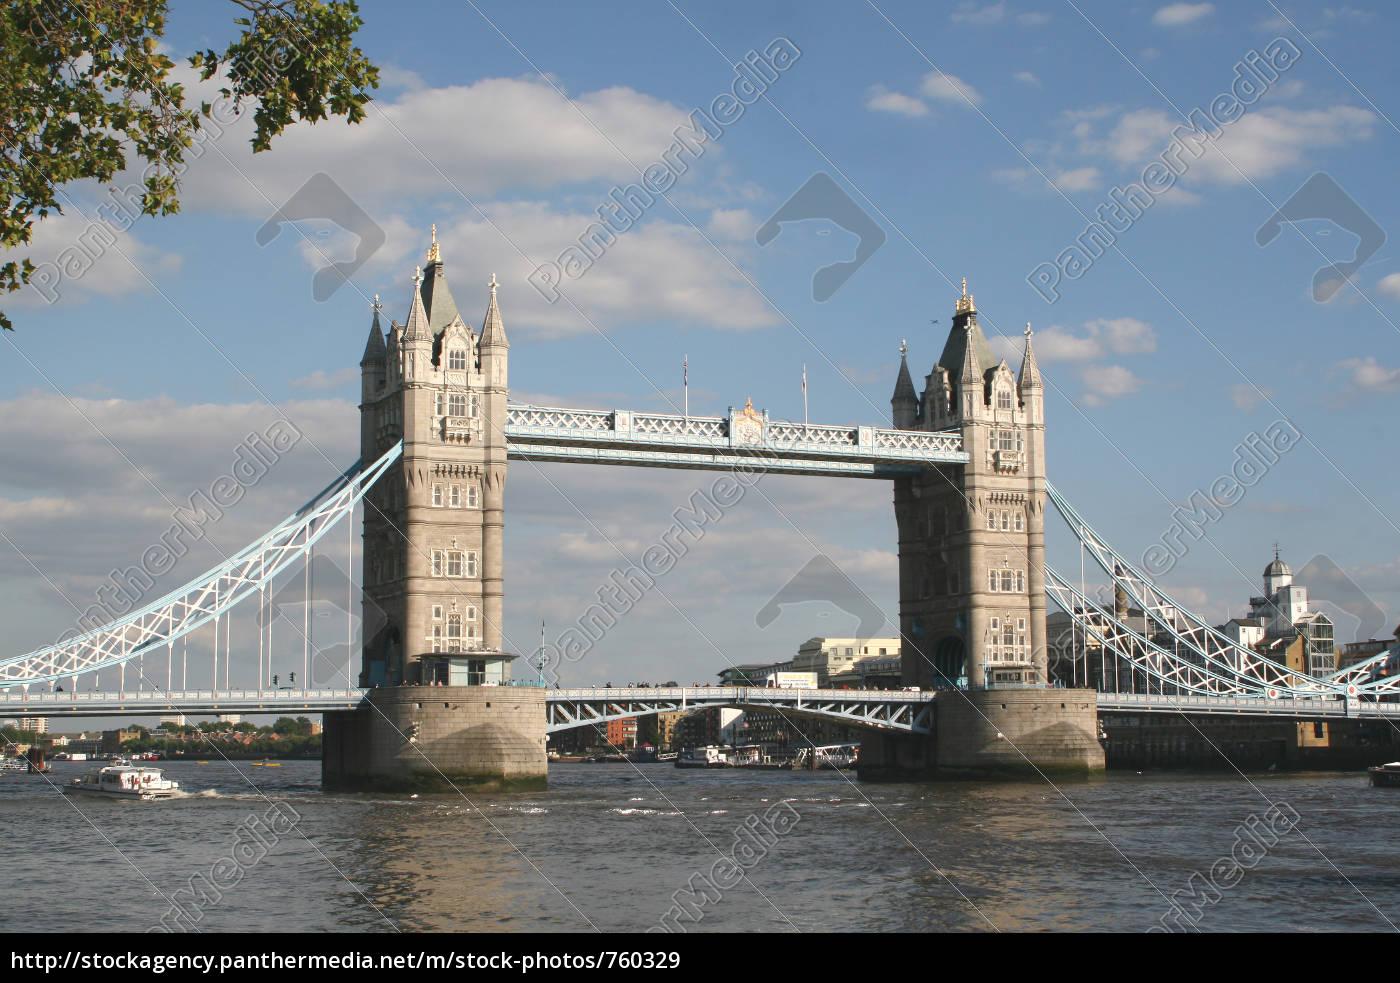 tower, bridge - 760329